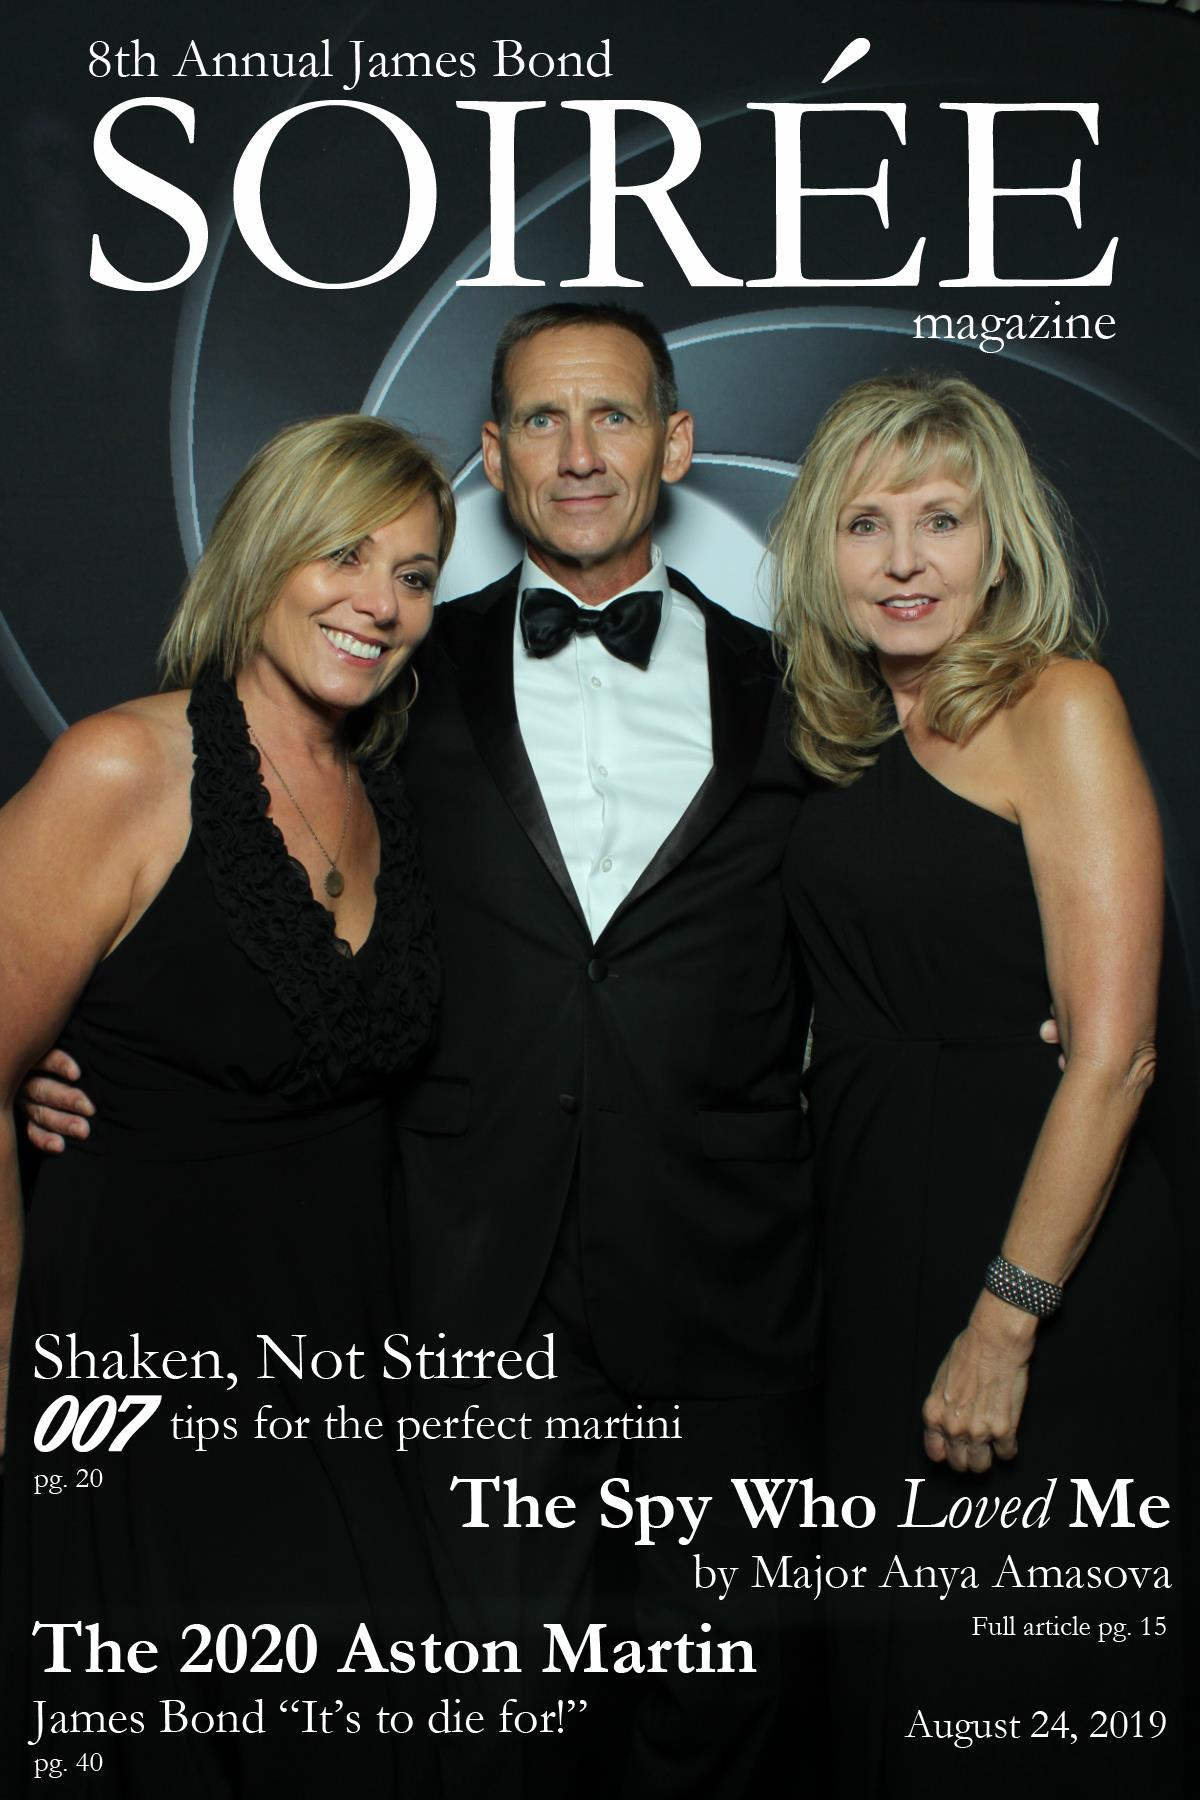 James Bond Soiree Magazine Cover, James Bond Look Alike, Bond Theme Night Pittsburgh